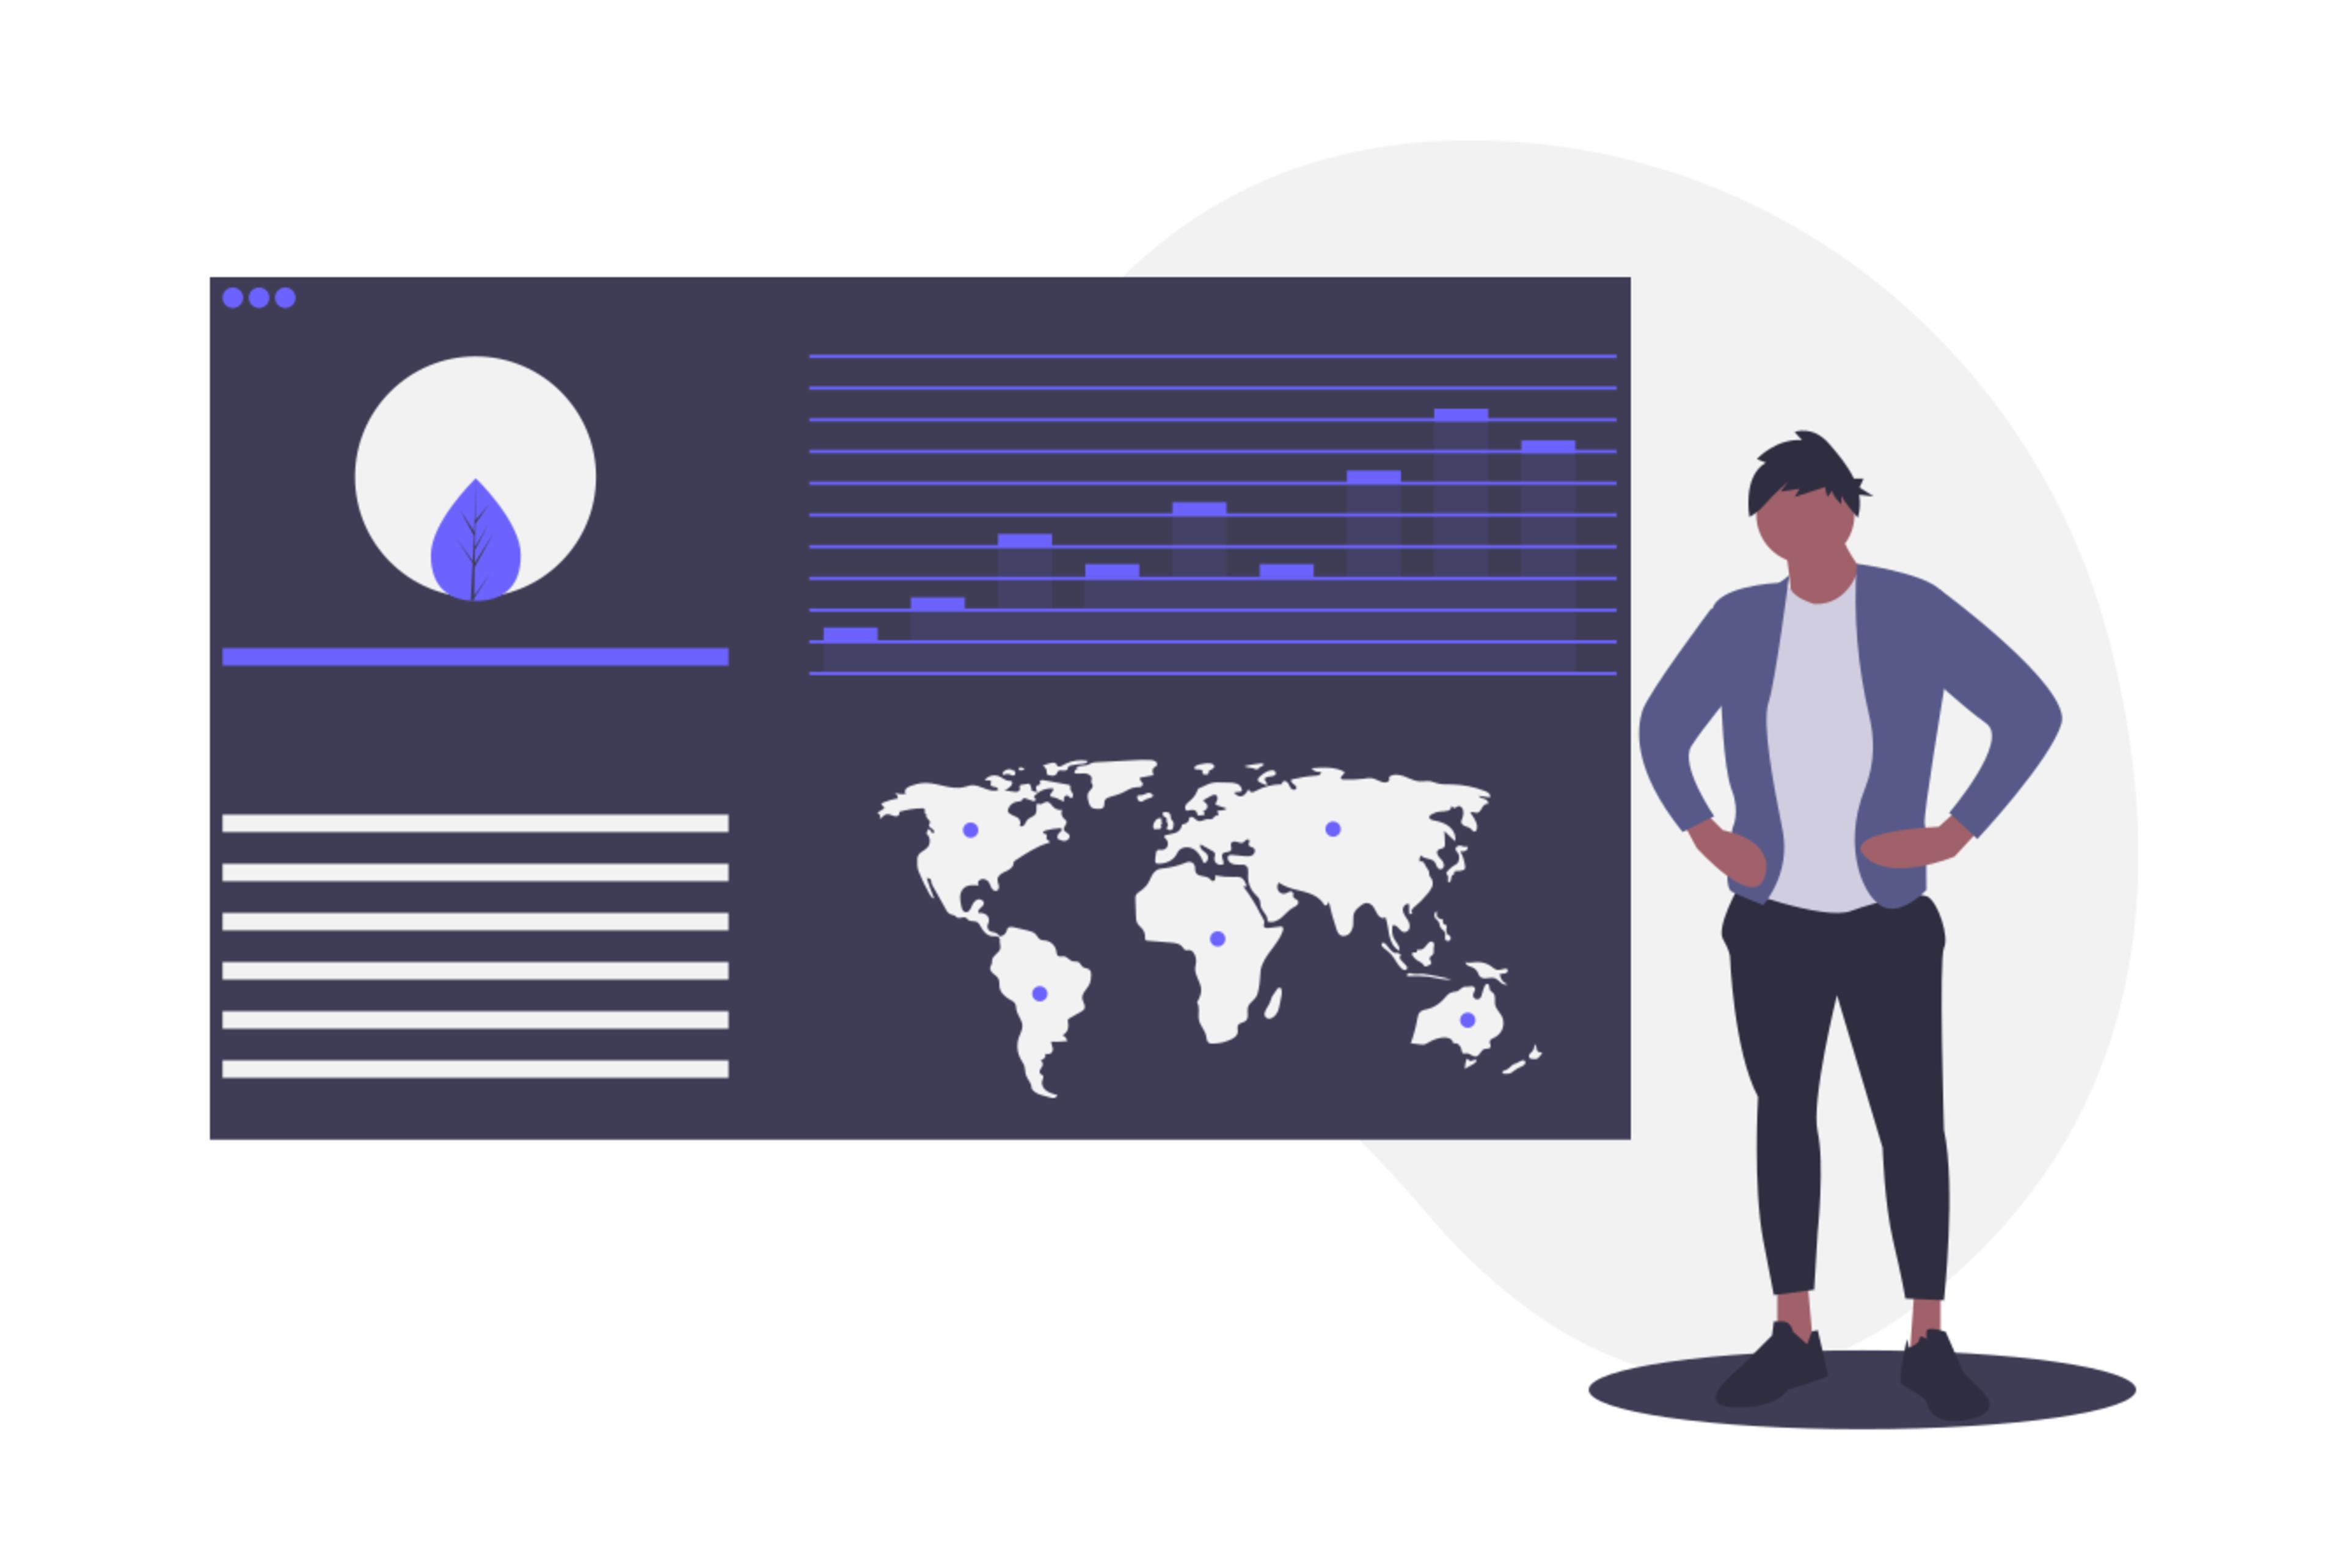 Human Resources Metrics Dashboard